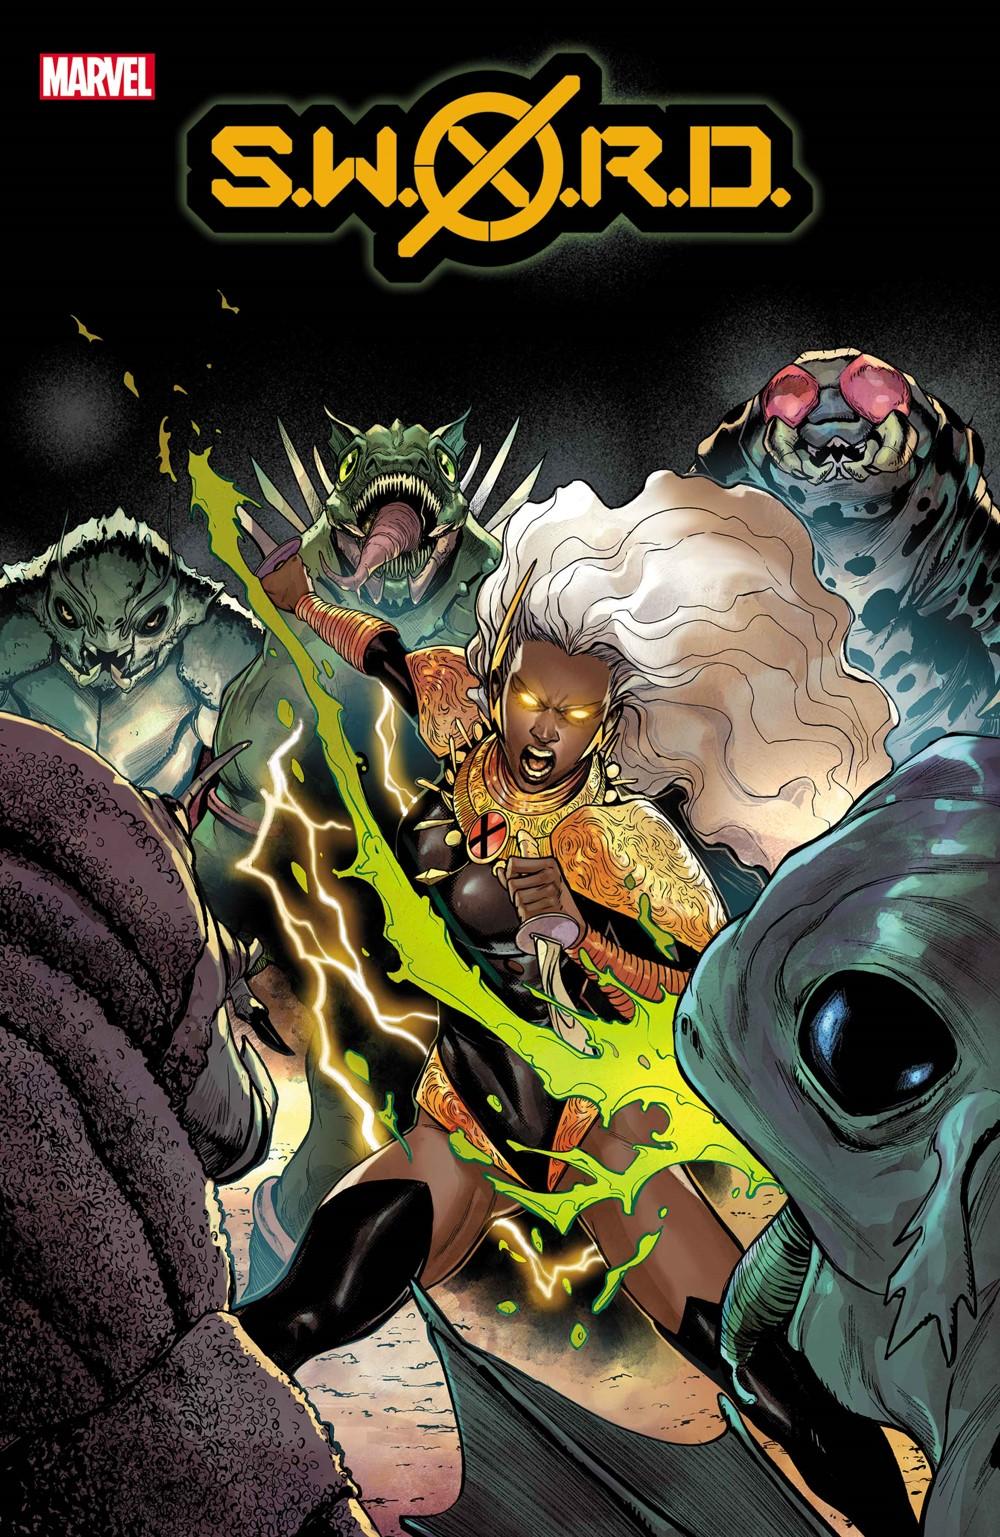 SWORD2020008_cov Marvel Comics September 2021 Solicitations